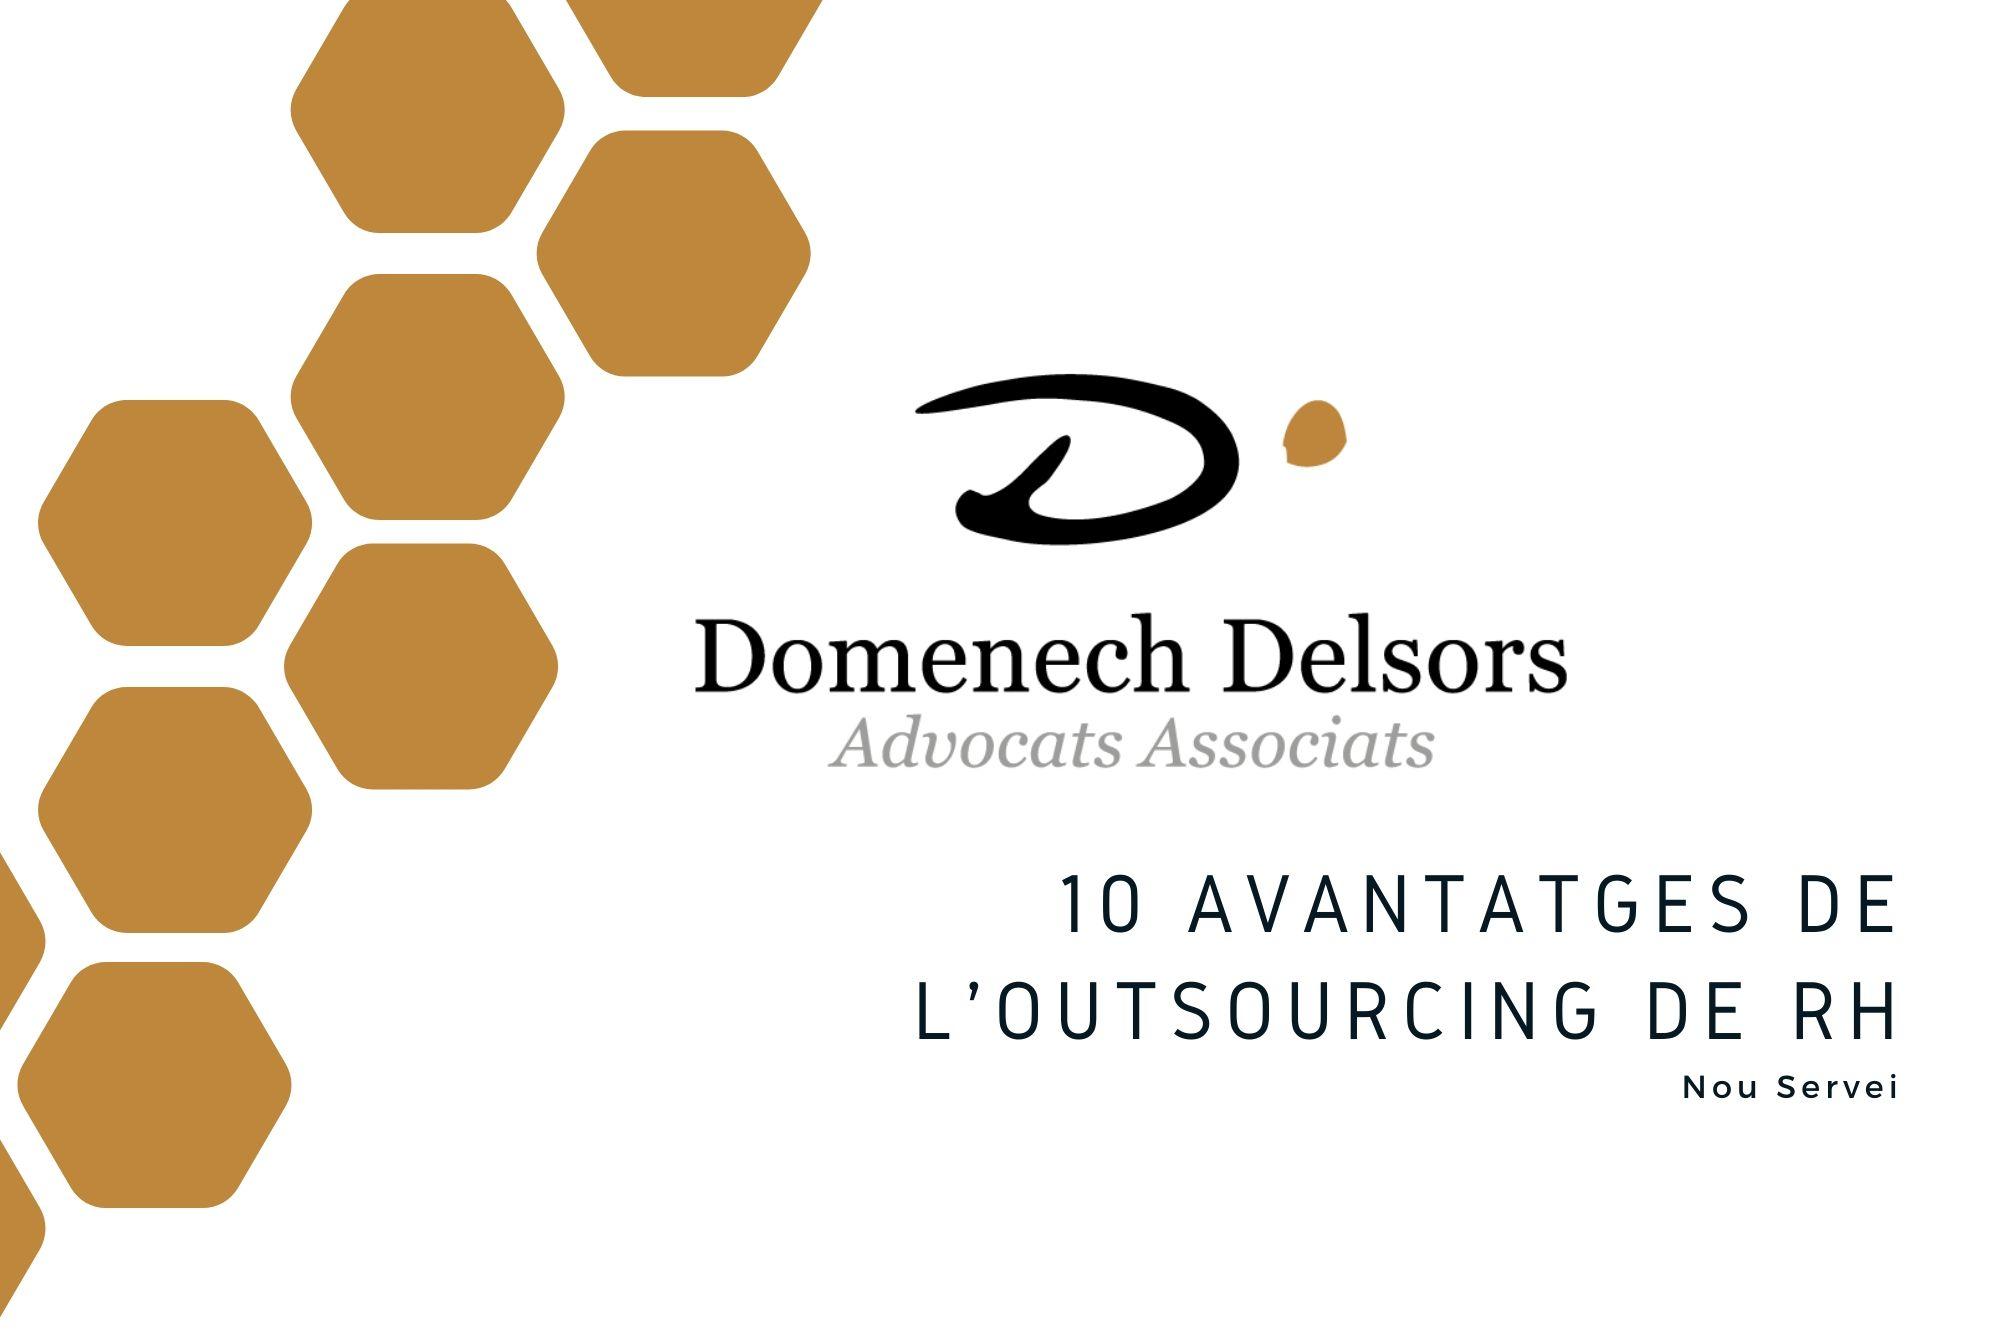 10 Avantatges De L'Outsourcing De RH De Domenech Delsors Advocats